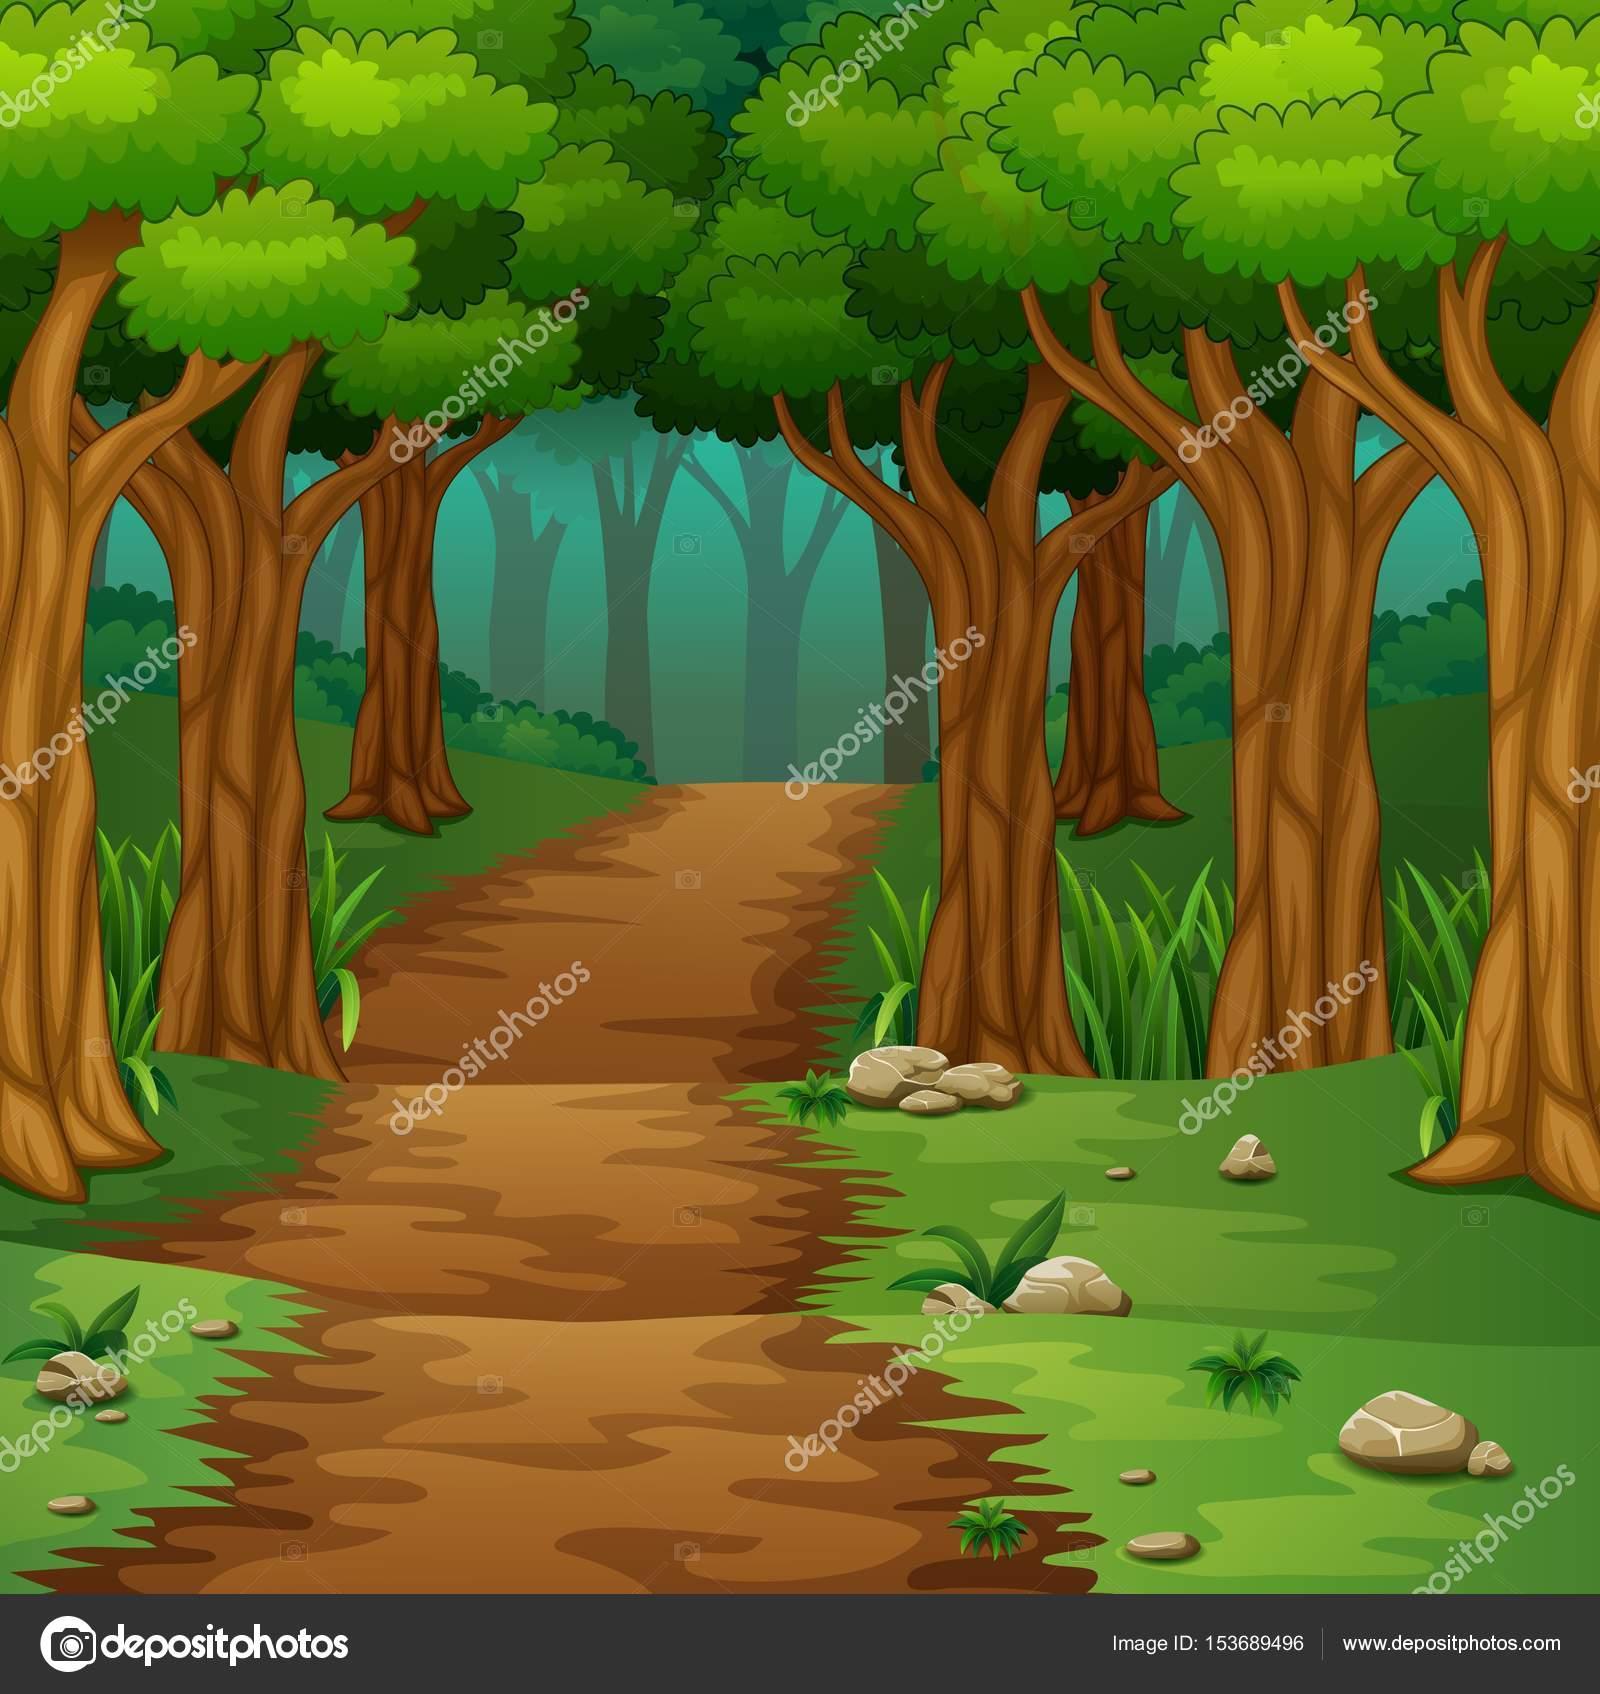 free online dating & chat in woods cross roads Woods cross dating site, 100% free online dating in woods cross youdatenet is where to find love, friends, flirt, date, chat, meet singles in woods cross.